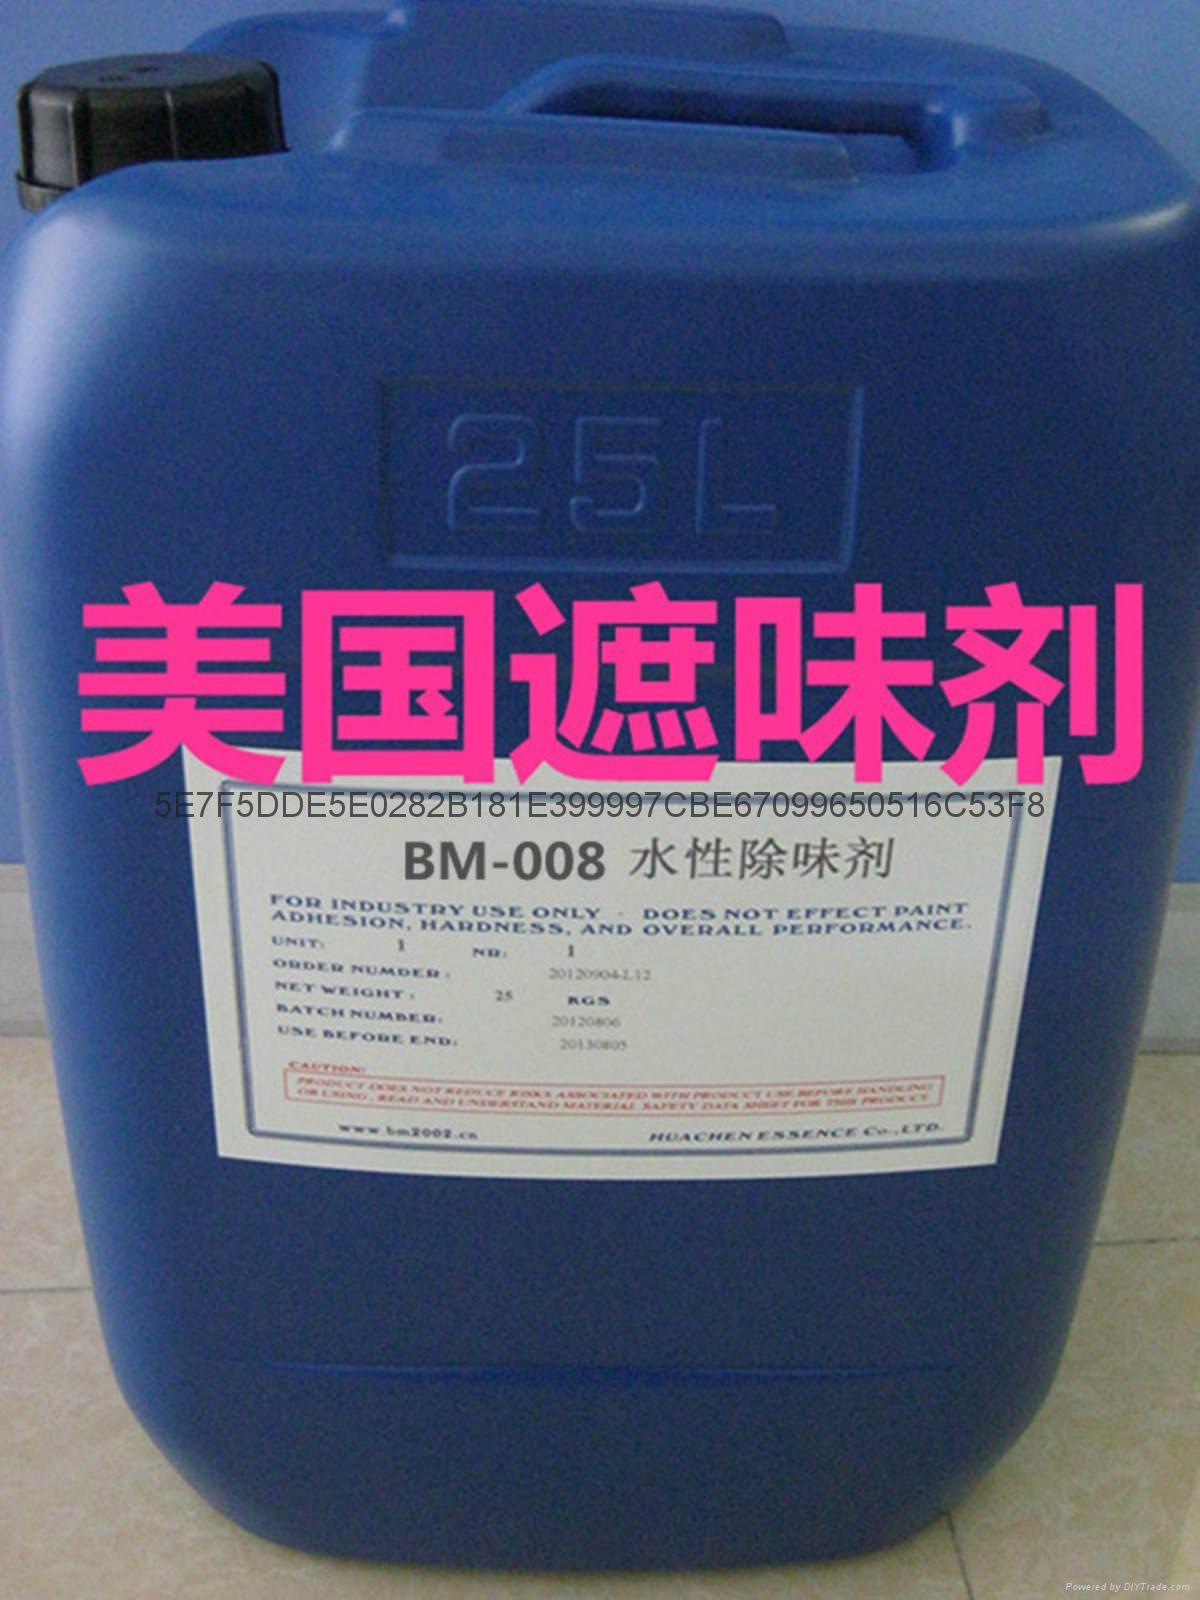 BM-008乳液除味劑乳液除臭劑乳液遮味劑 1